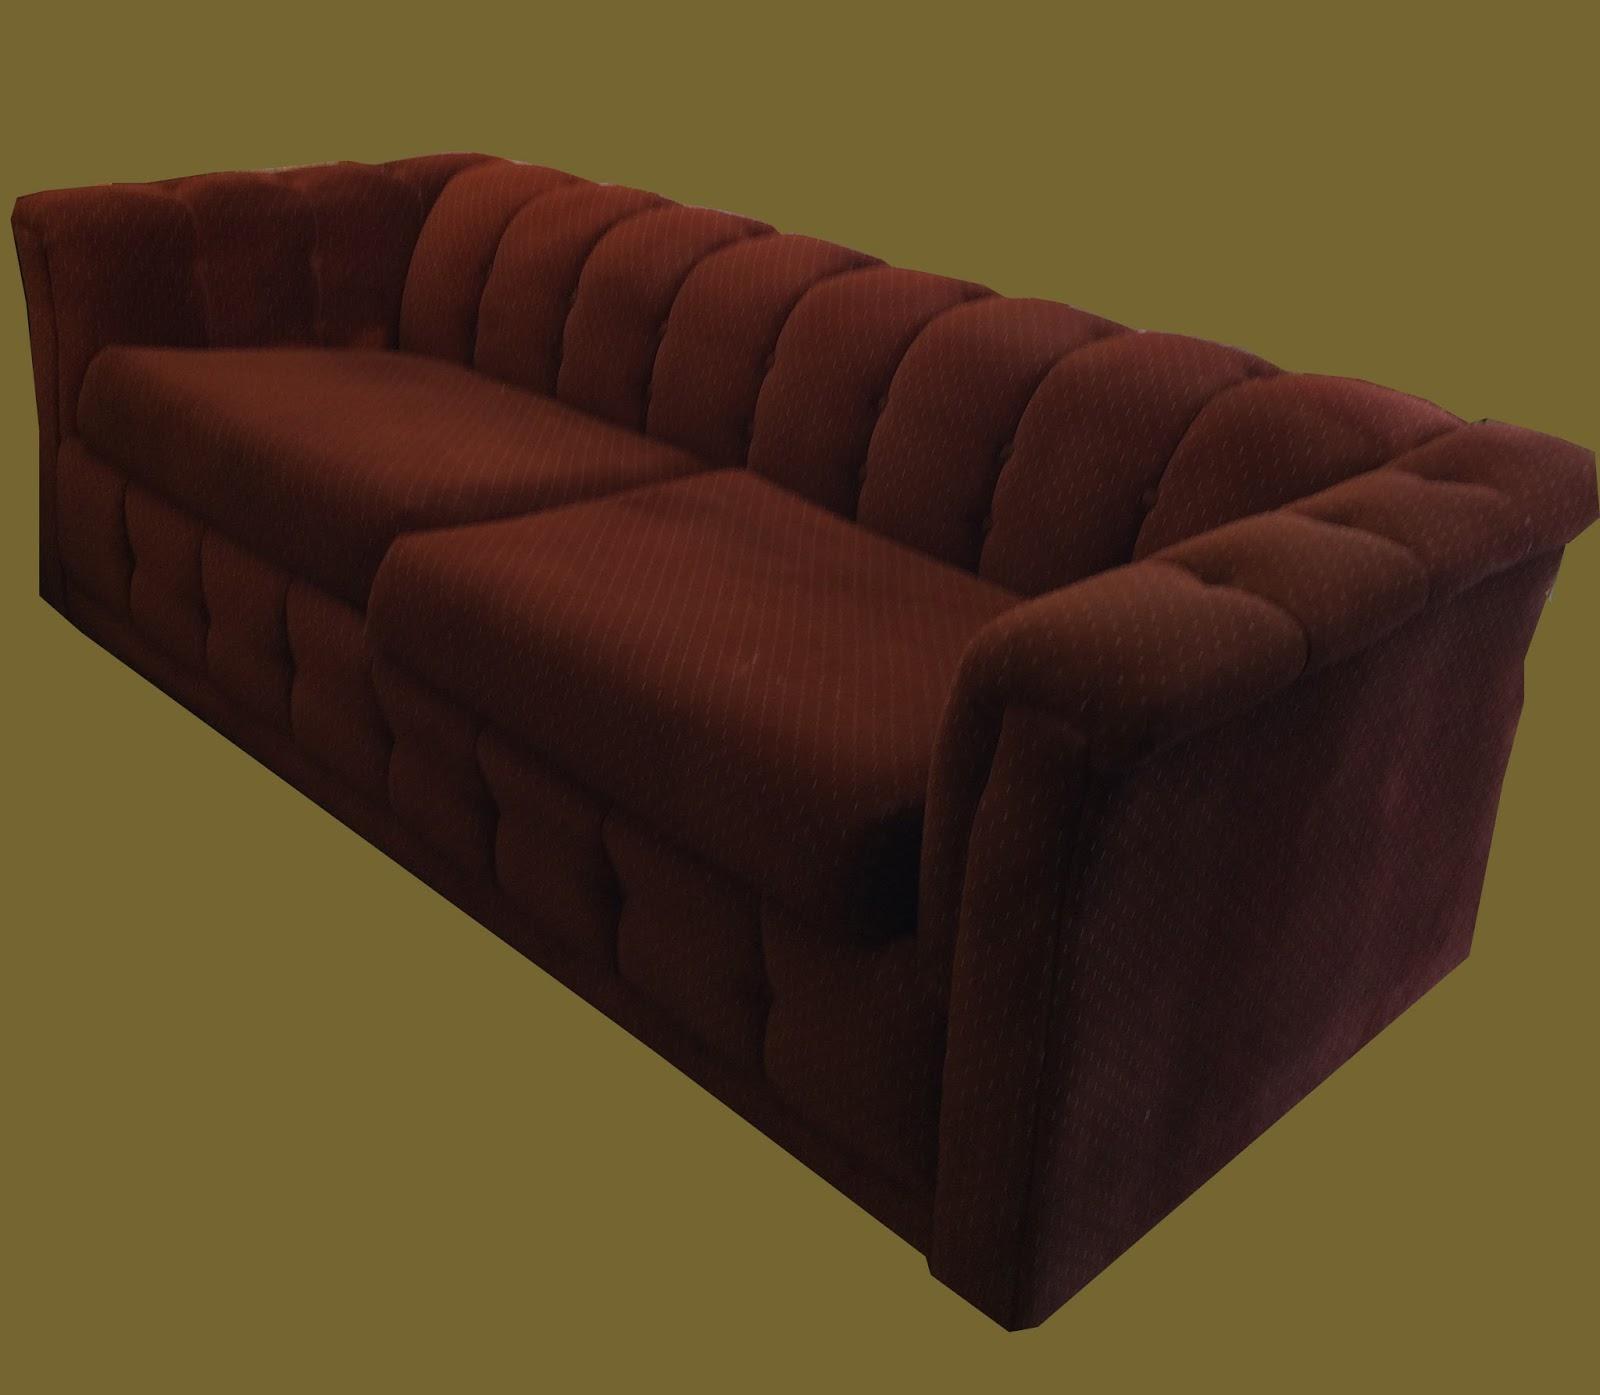 Vintage Sleeper Sofa   $175 $125 SOLD